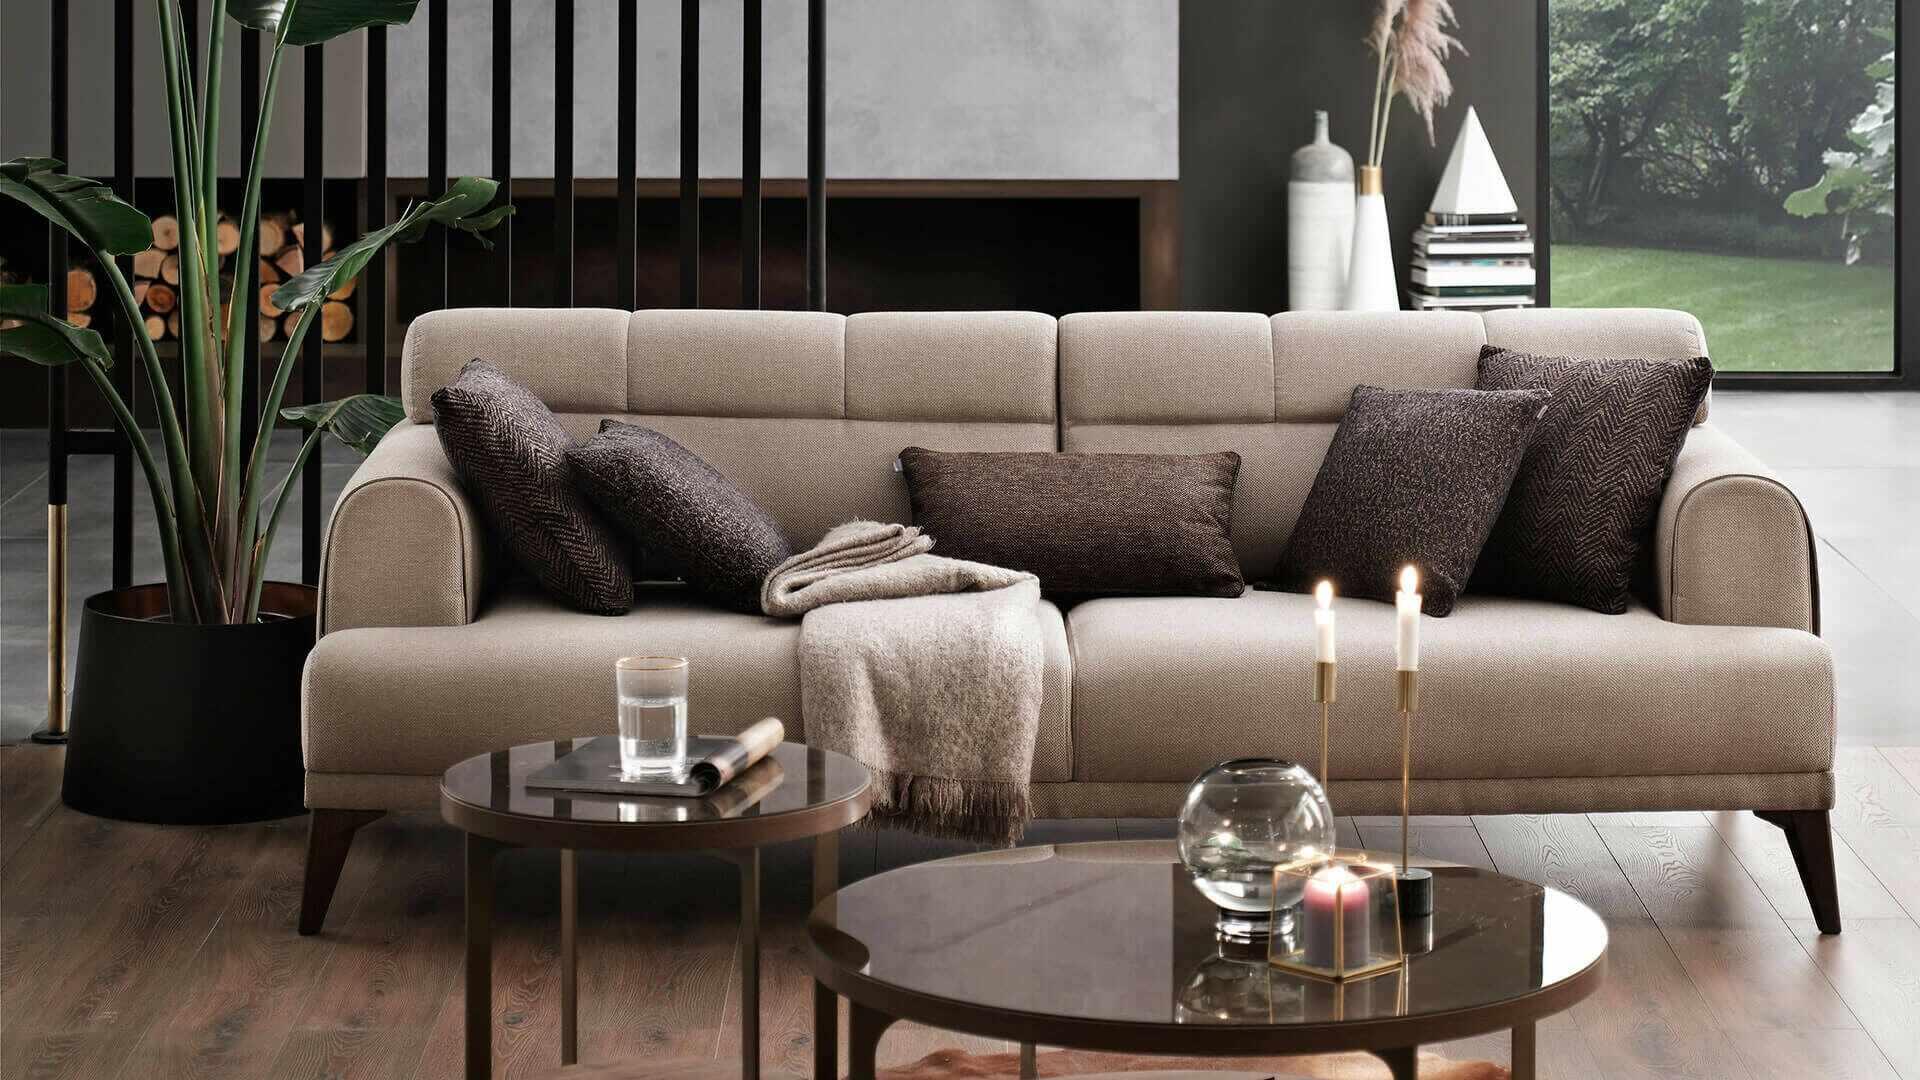 Canapea fixa cu mecanism Relax, tapitata cu stofa 3 locuri Madrid Bej, l231xA102xH80 cm la pret 4105 lei